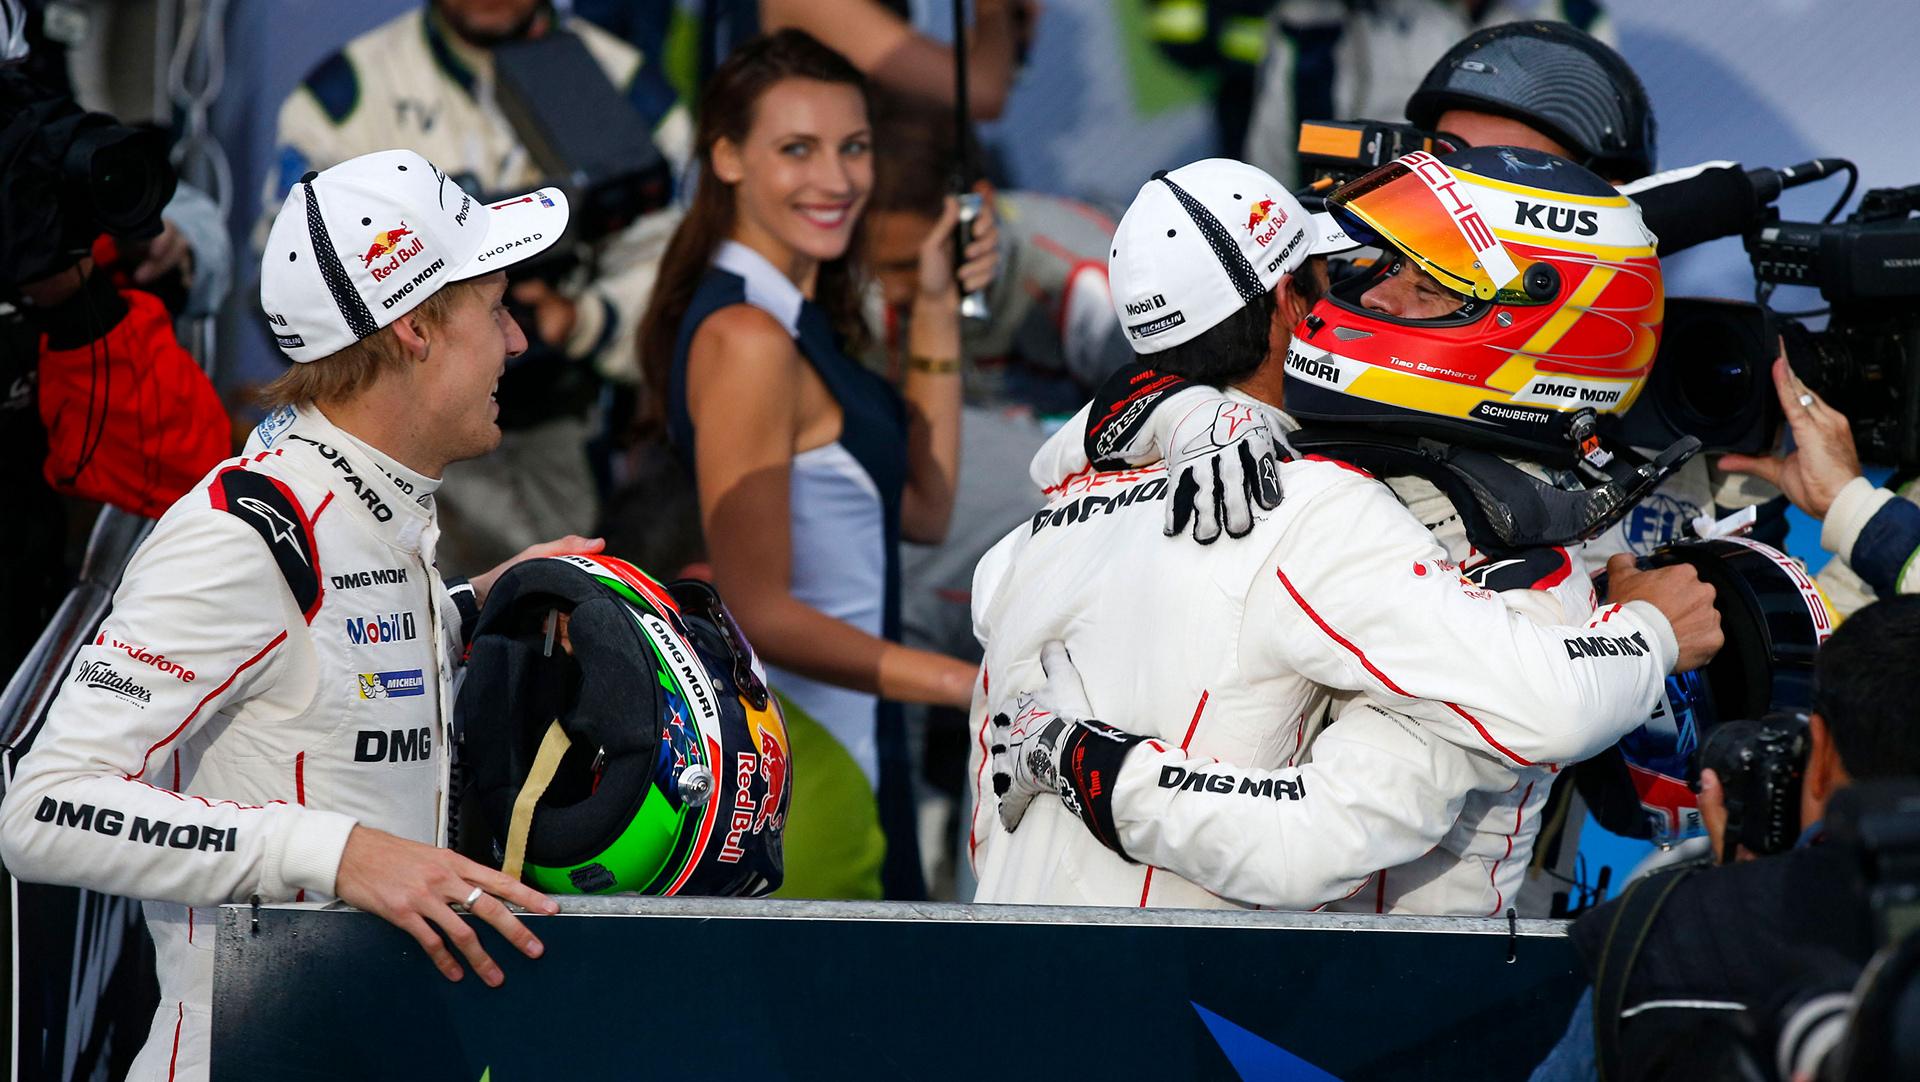 Brendon Hartley (l.), Porsche work driver, Mark Webber, Porsche work driver, Timo Bernhard, Porsche work driver, WEC © Dr. Ing. h.c. F. Porsche AG